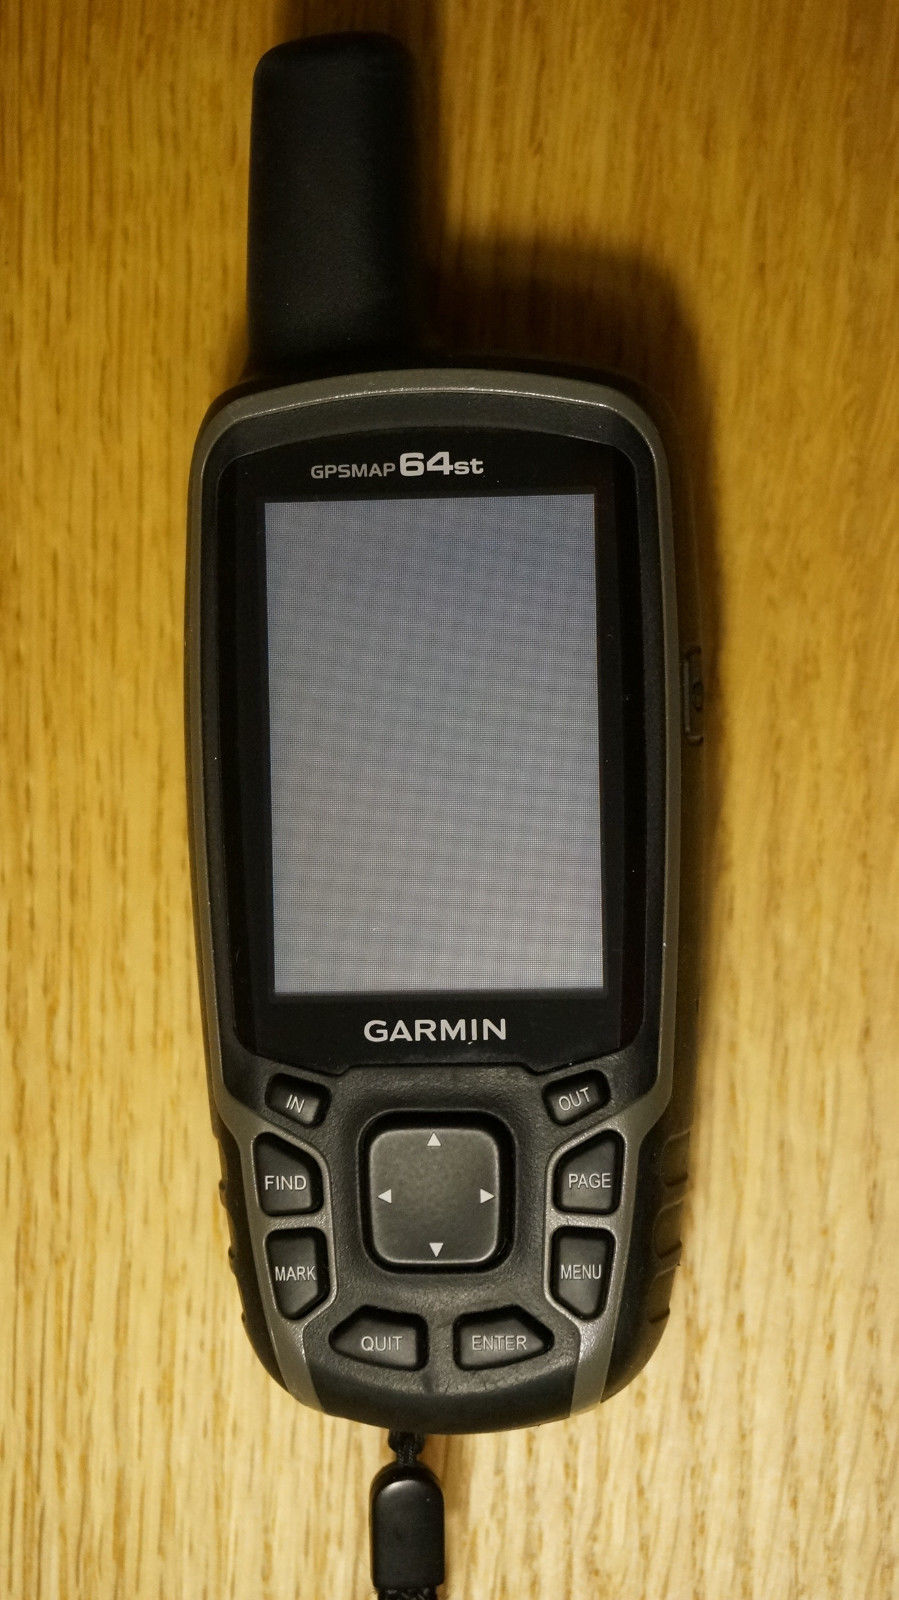 Garmin GPSMap 64st (8GB) + TOPO Deutschland V7 PRO (auf microSD)